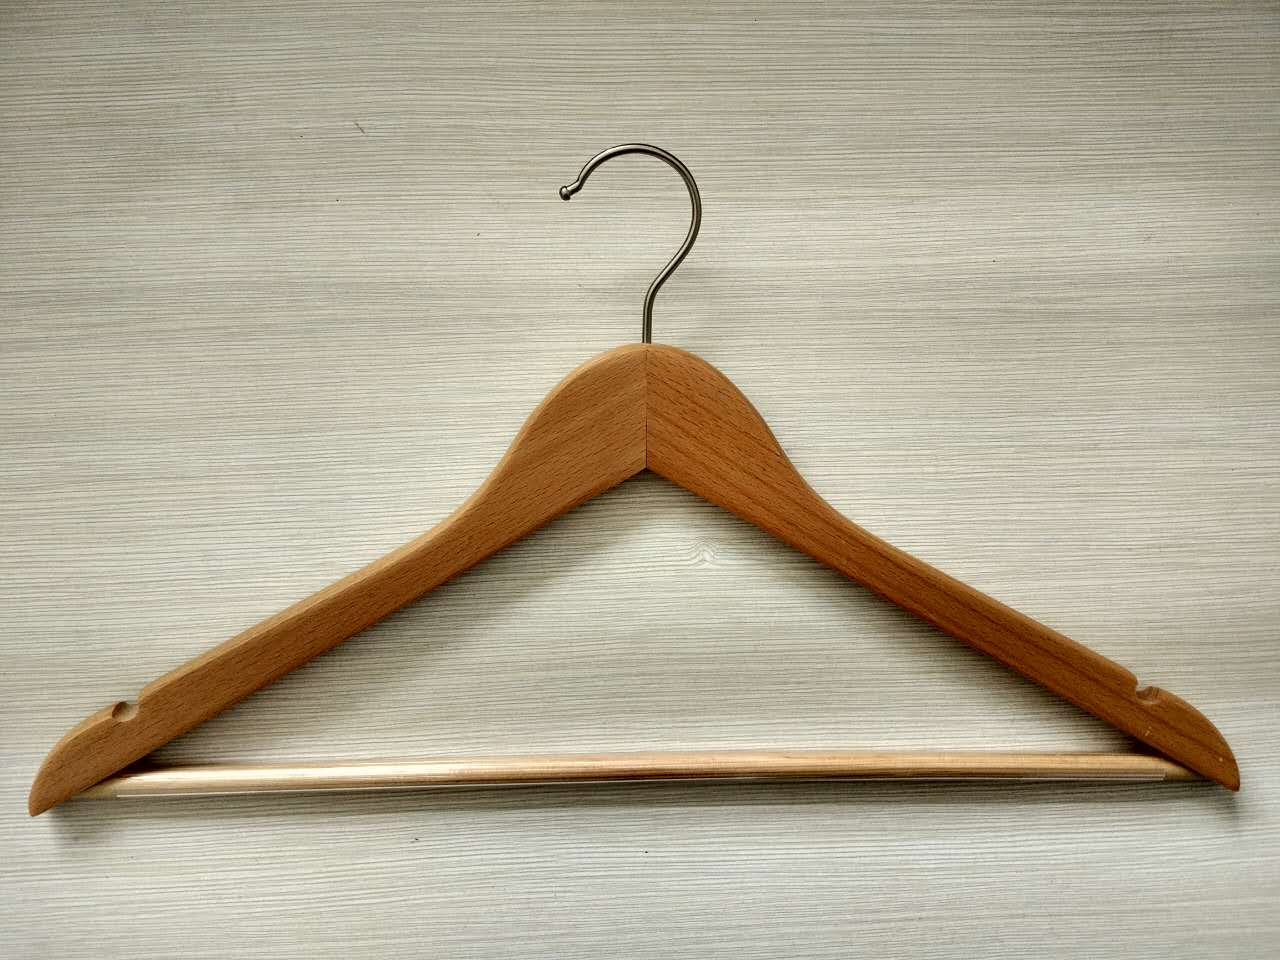 Natural wooden coat hanger with non-slip bar